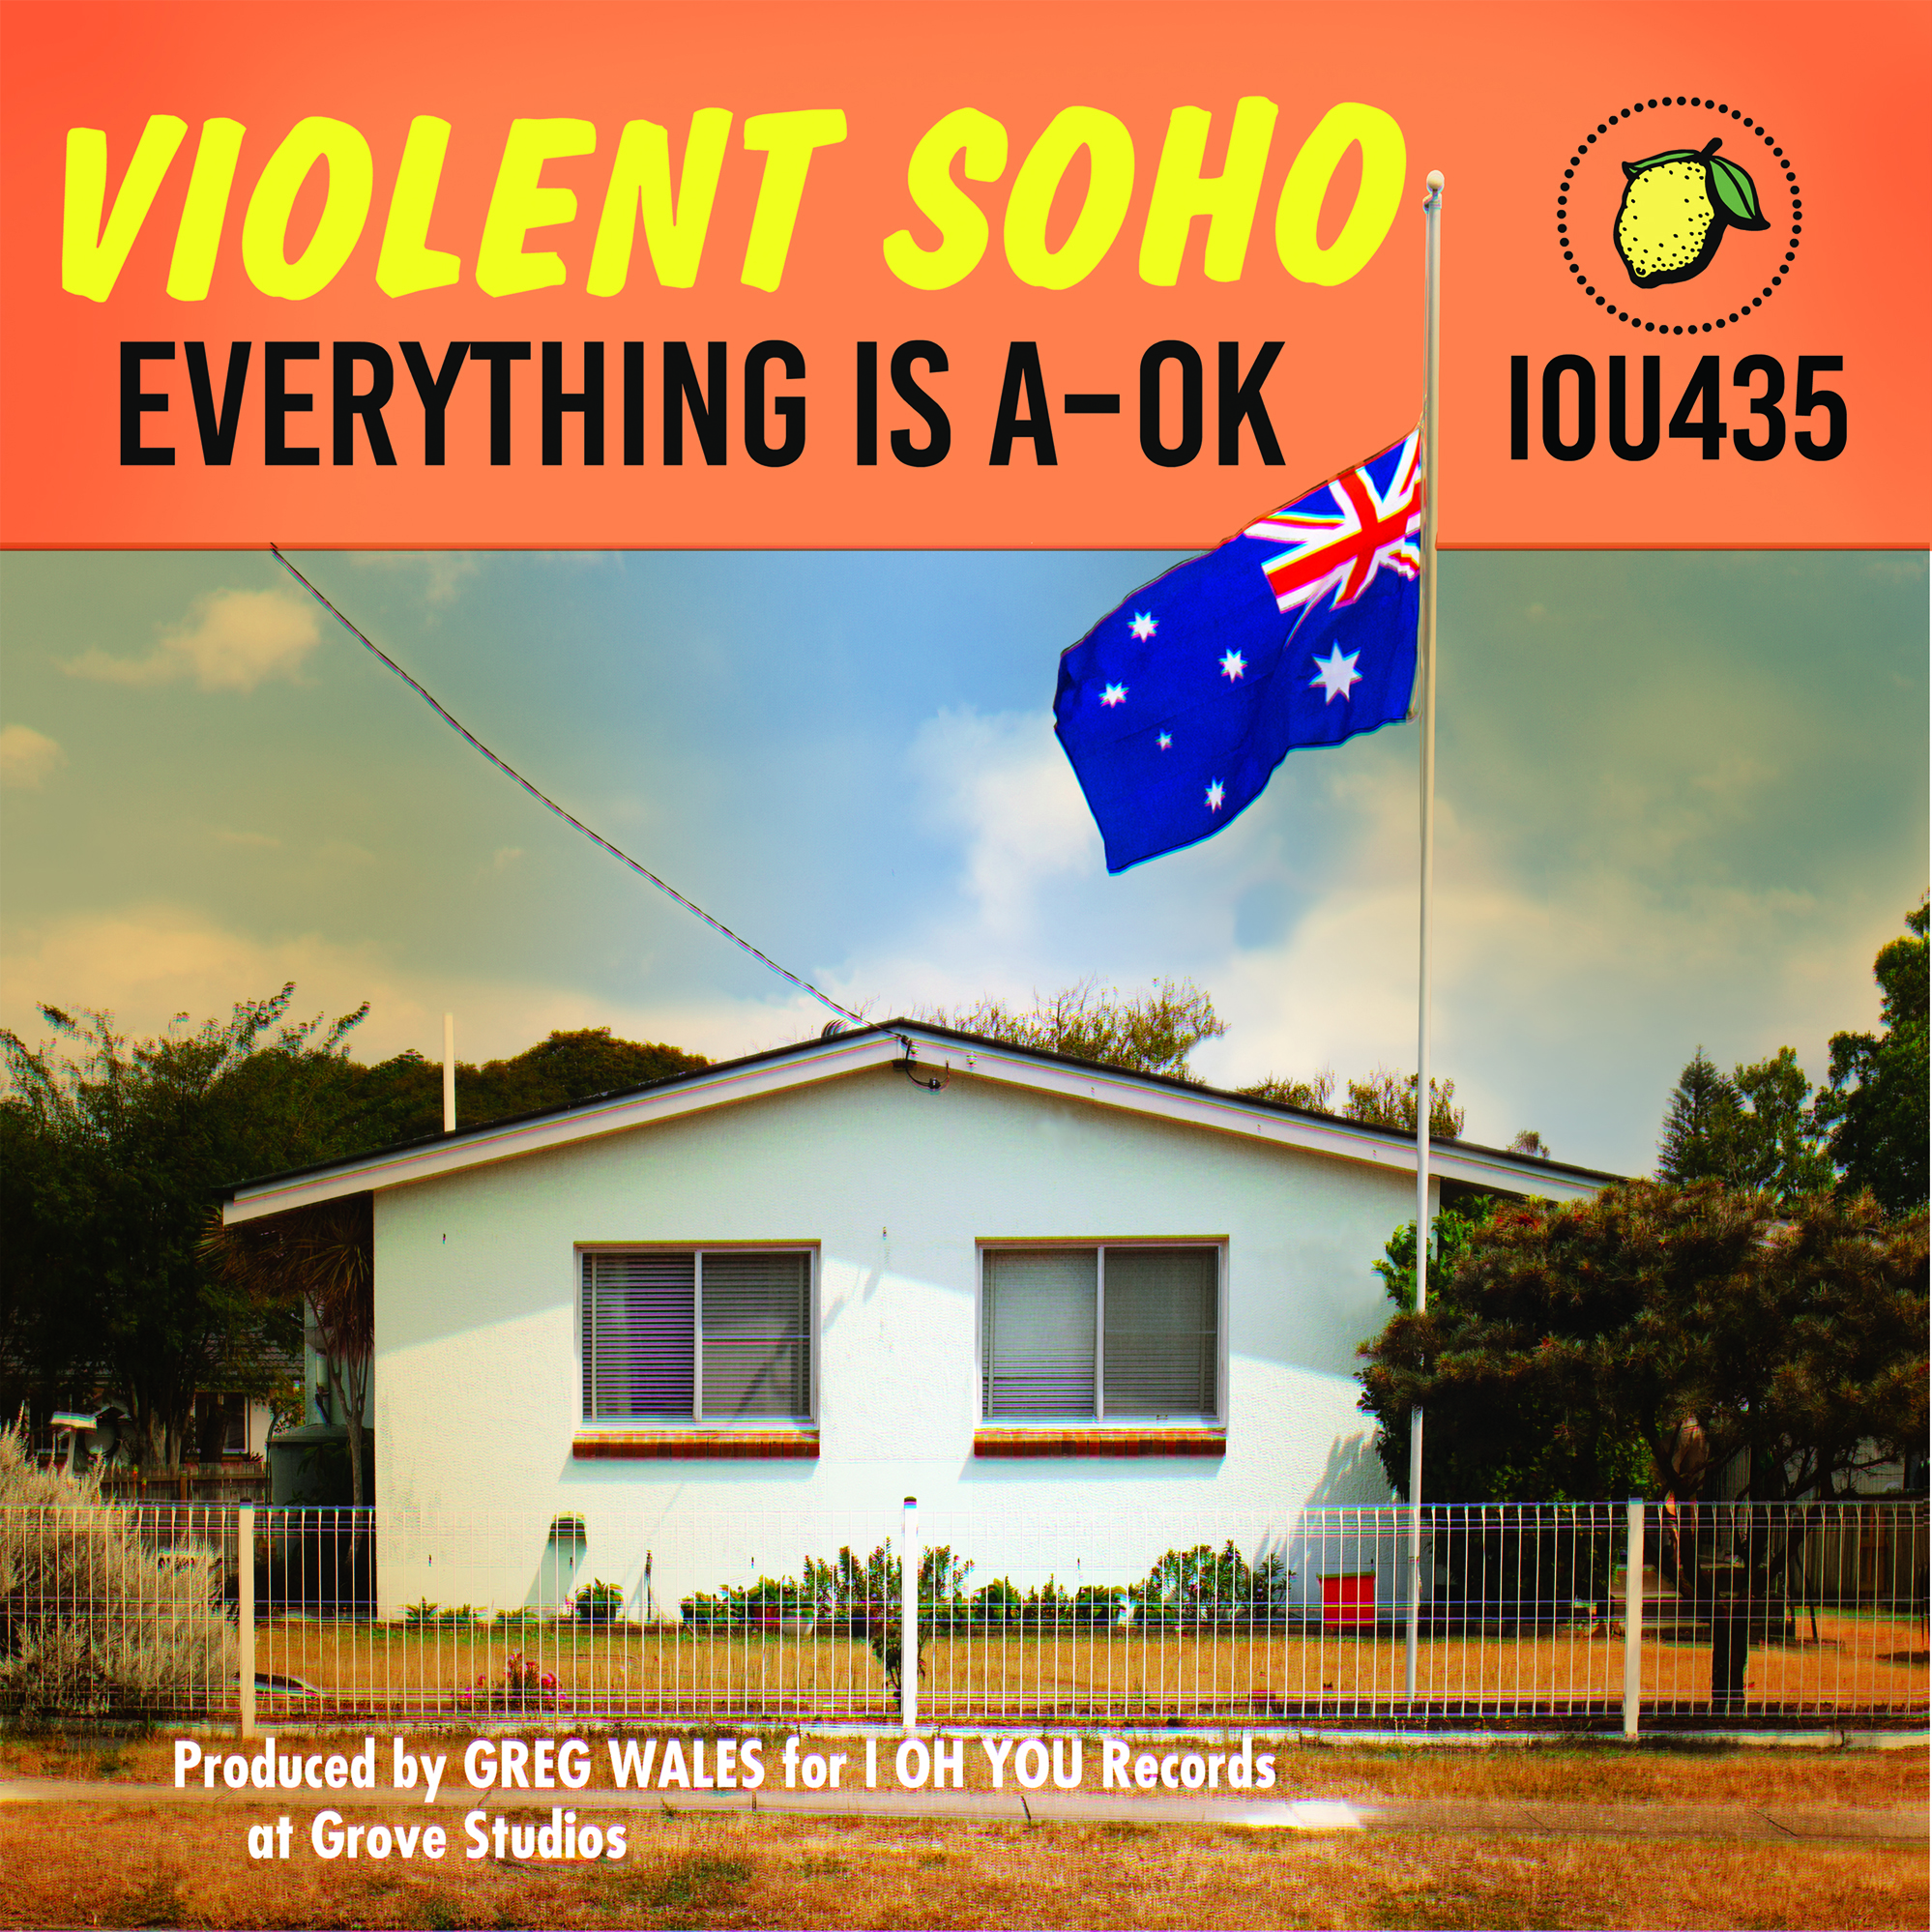 Violent Soho Everything Is A-Ok new album art